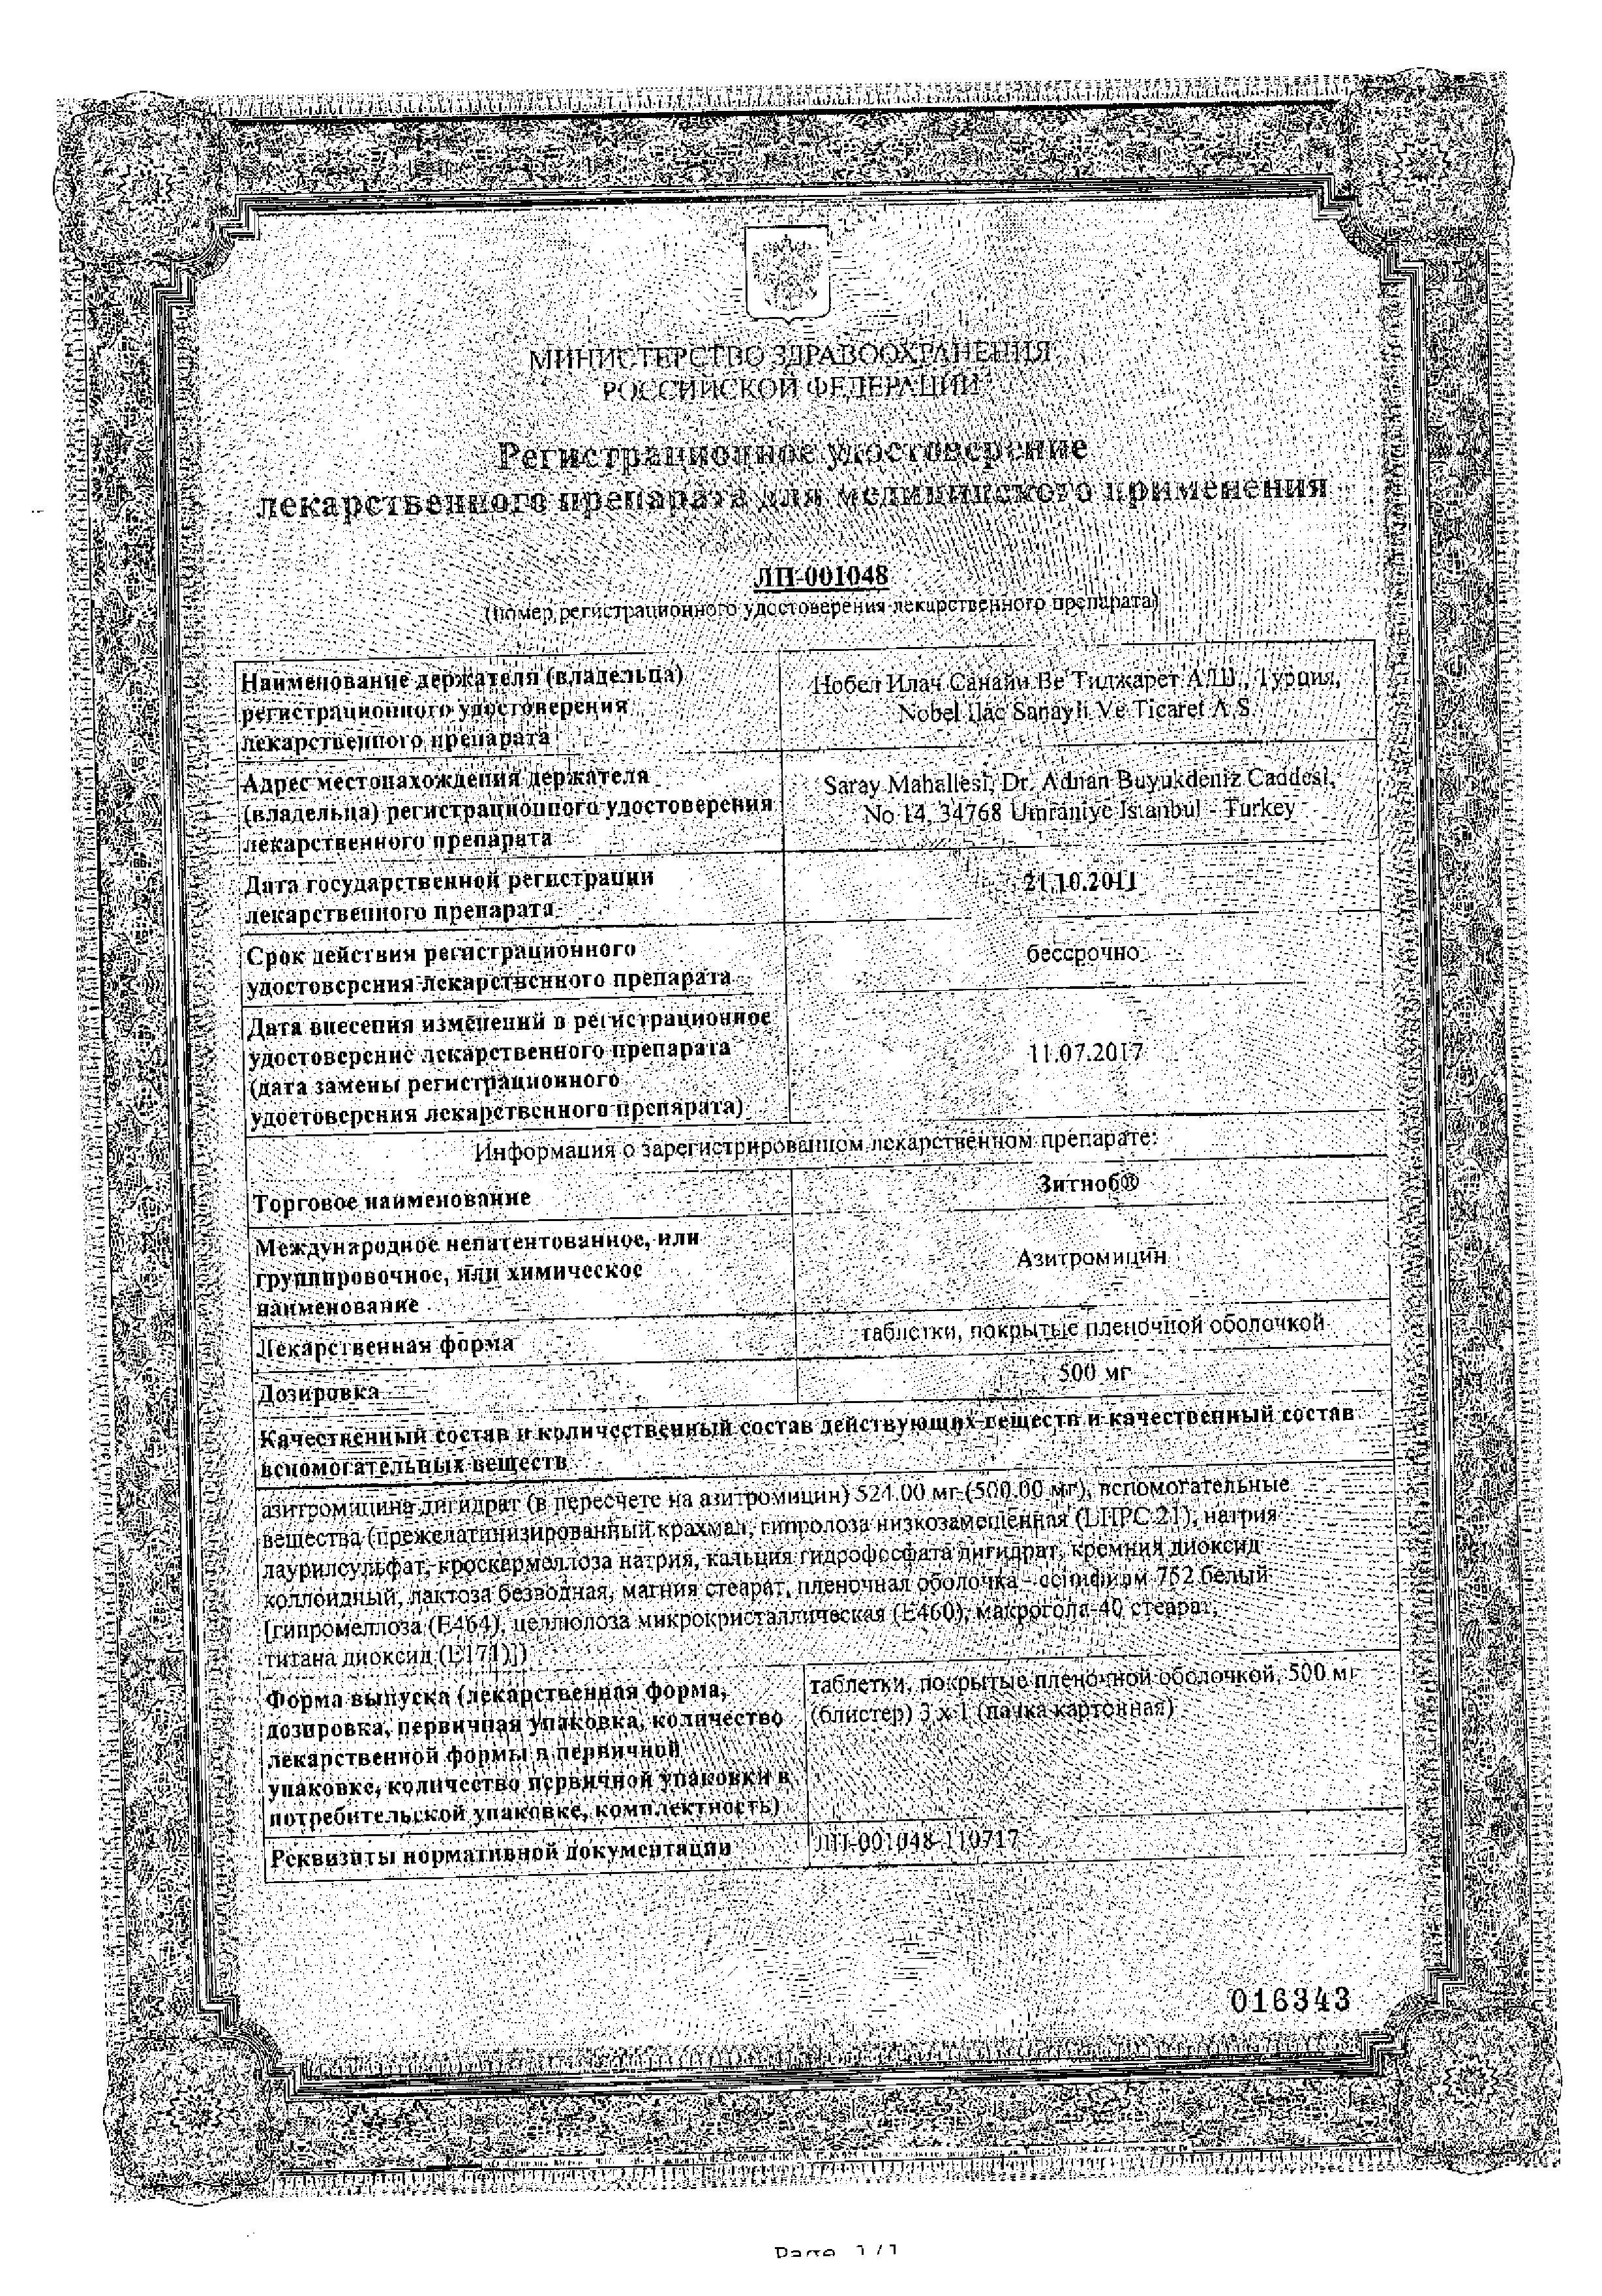 Зитноб сертификат